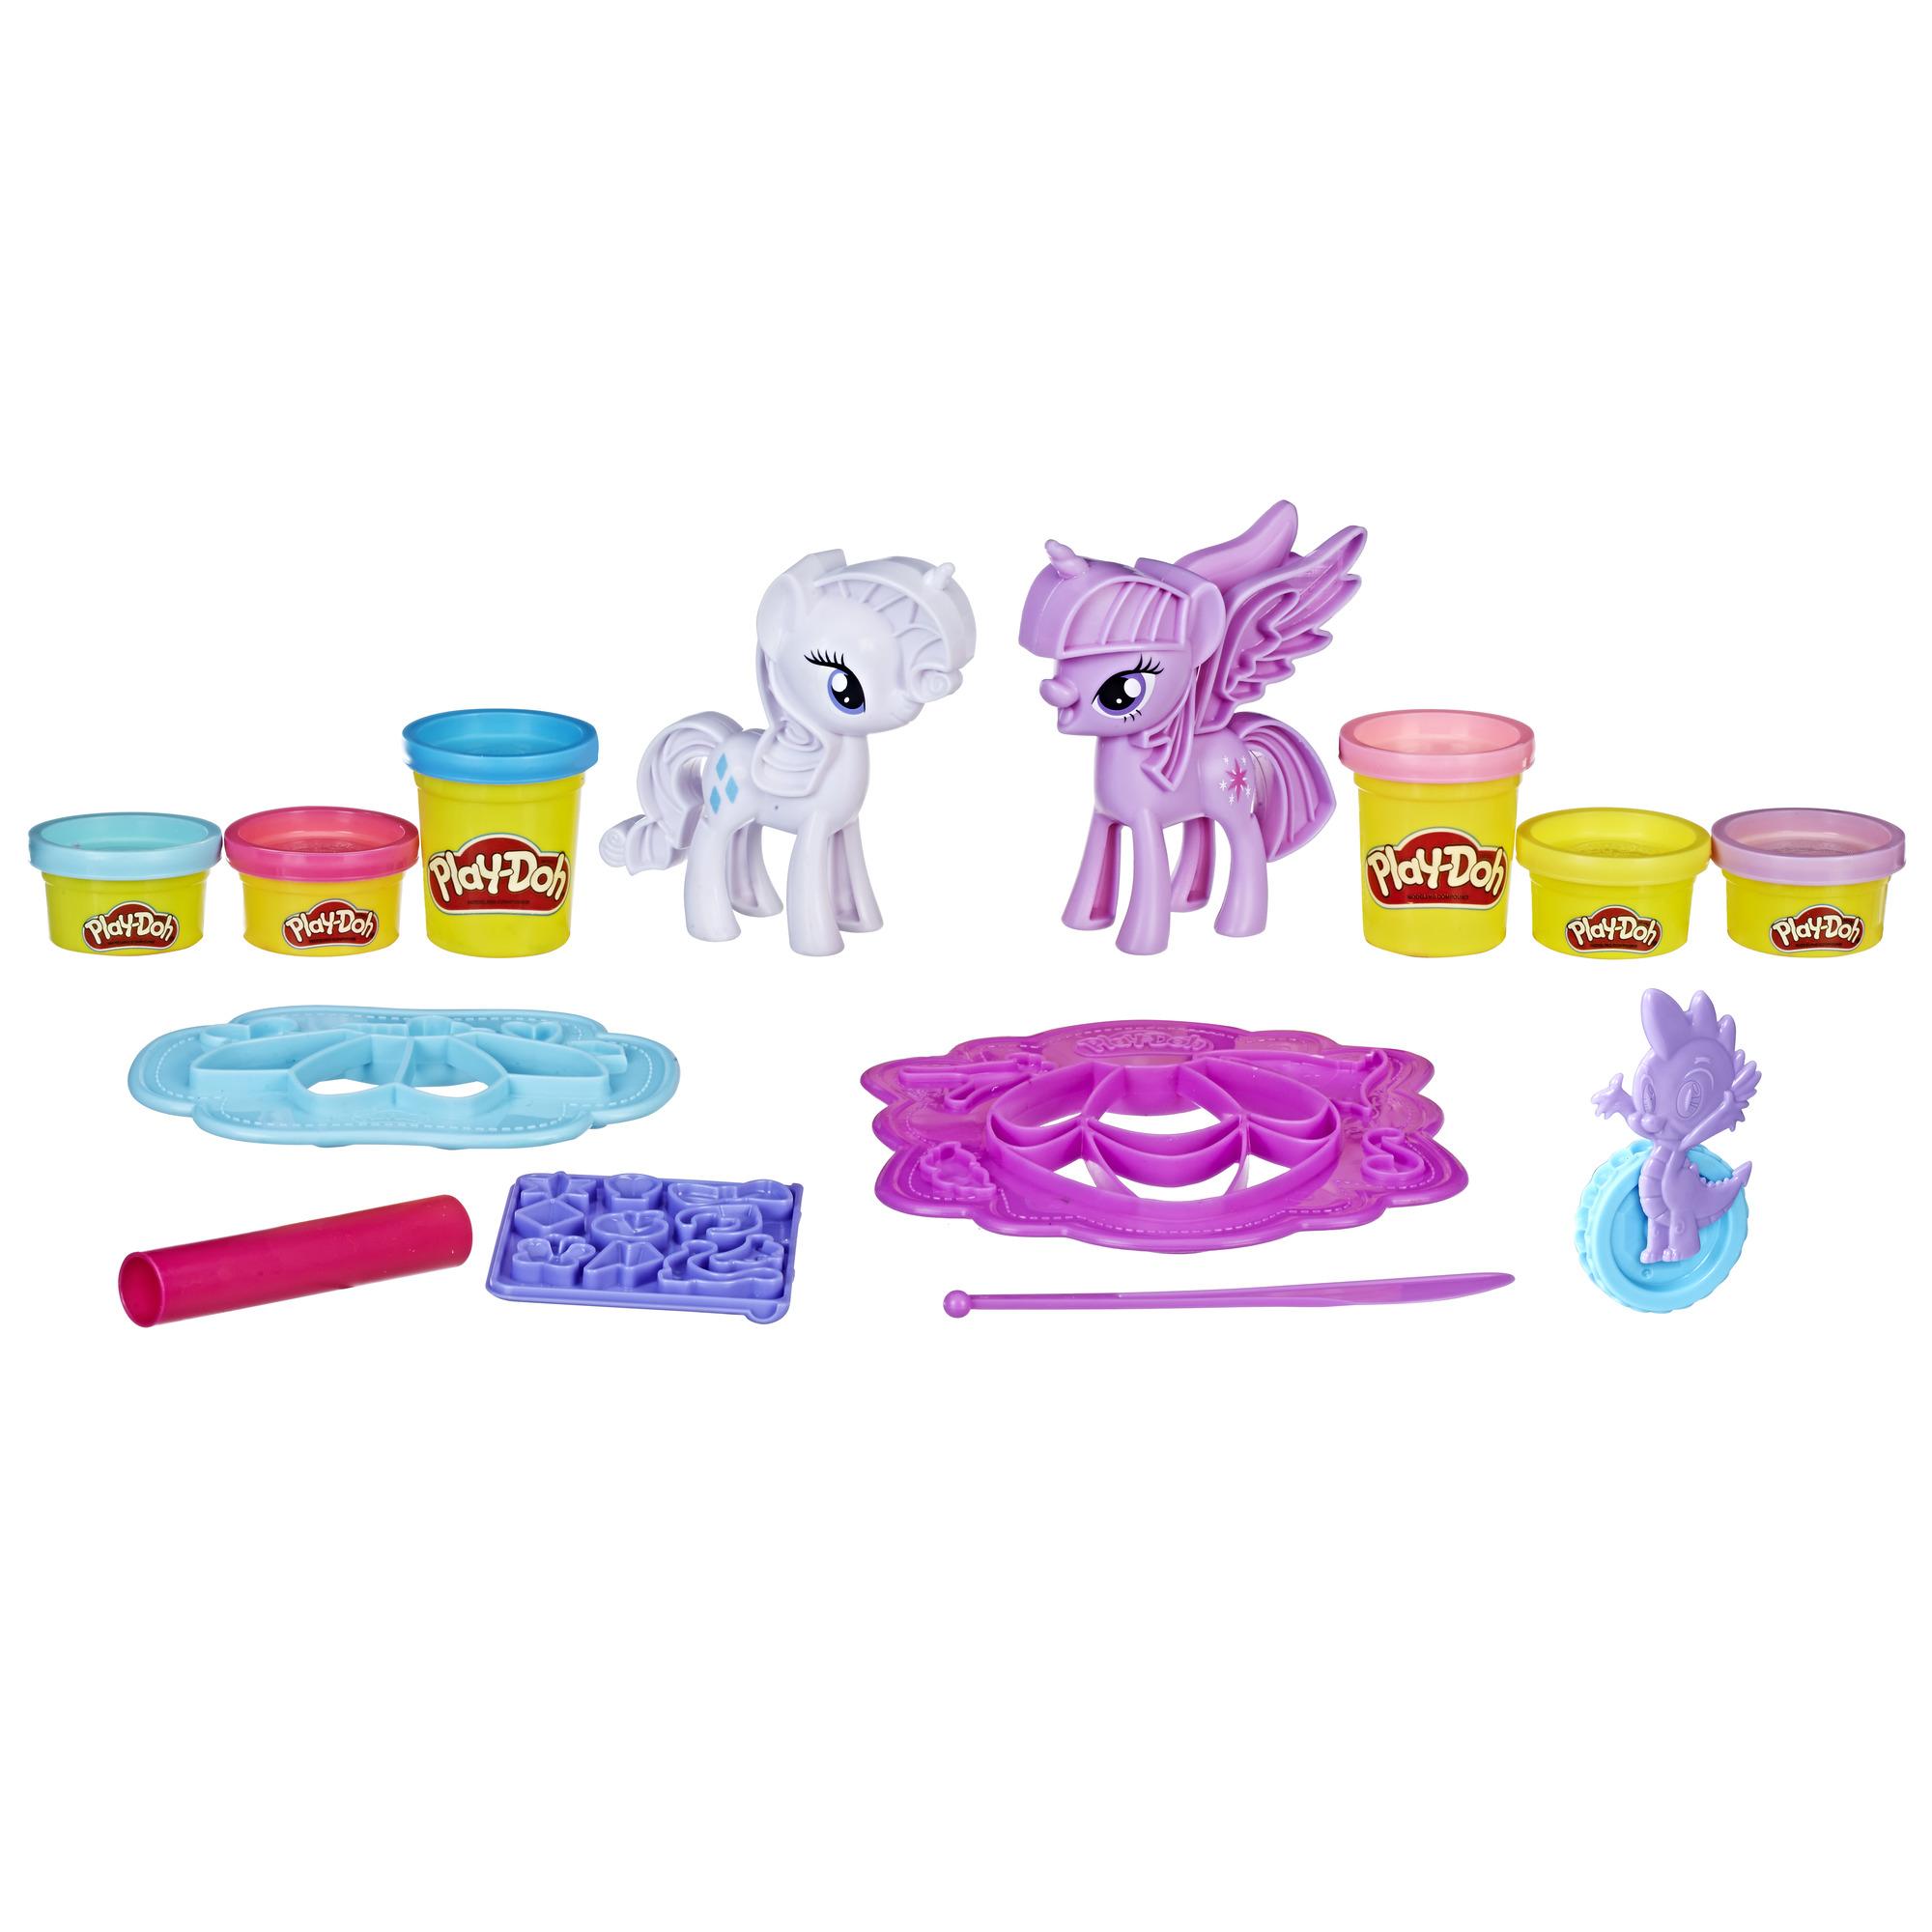 Play-Doh My Little Pony Princess Twilight Sparkle and Rarity Fashion Fun PartNumber: 004W009688816001P KsnValue: 9688816 MfgPartNumber: B9717